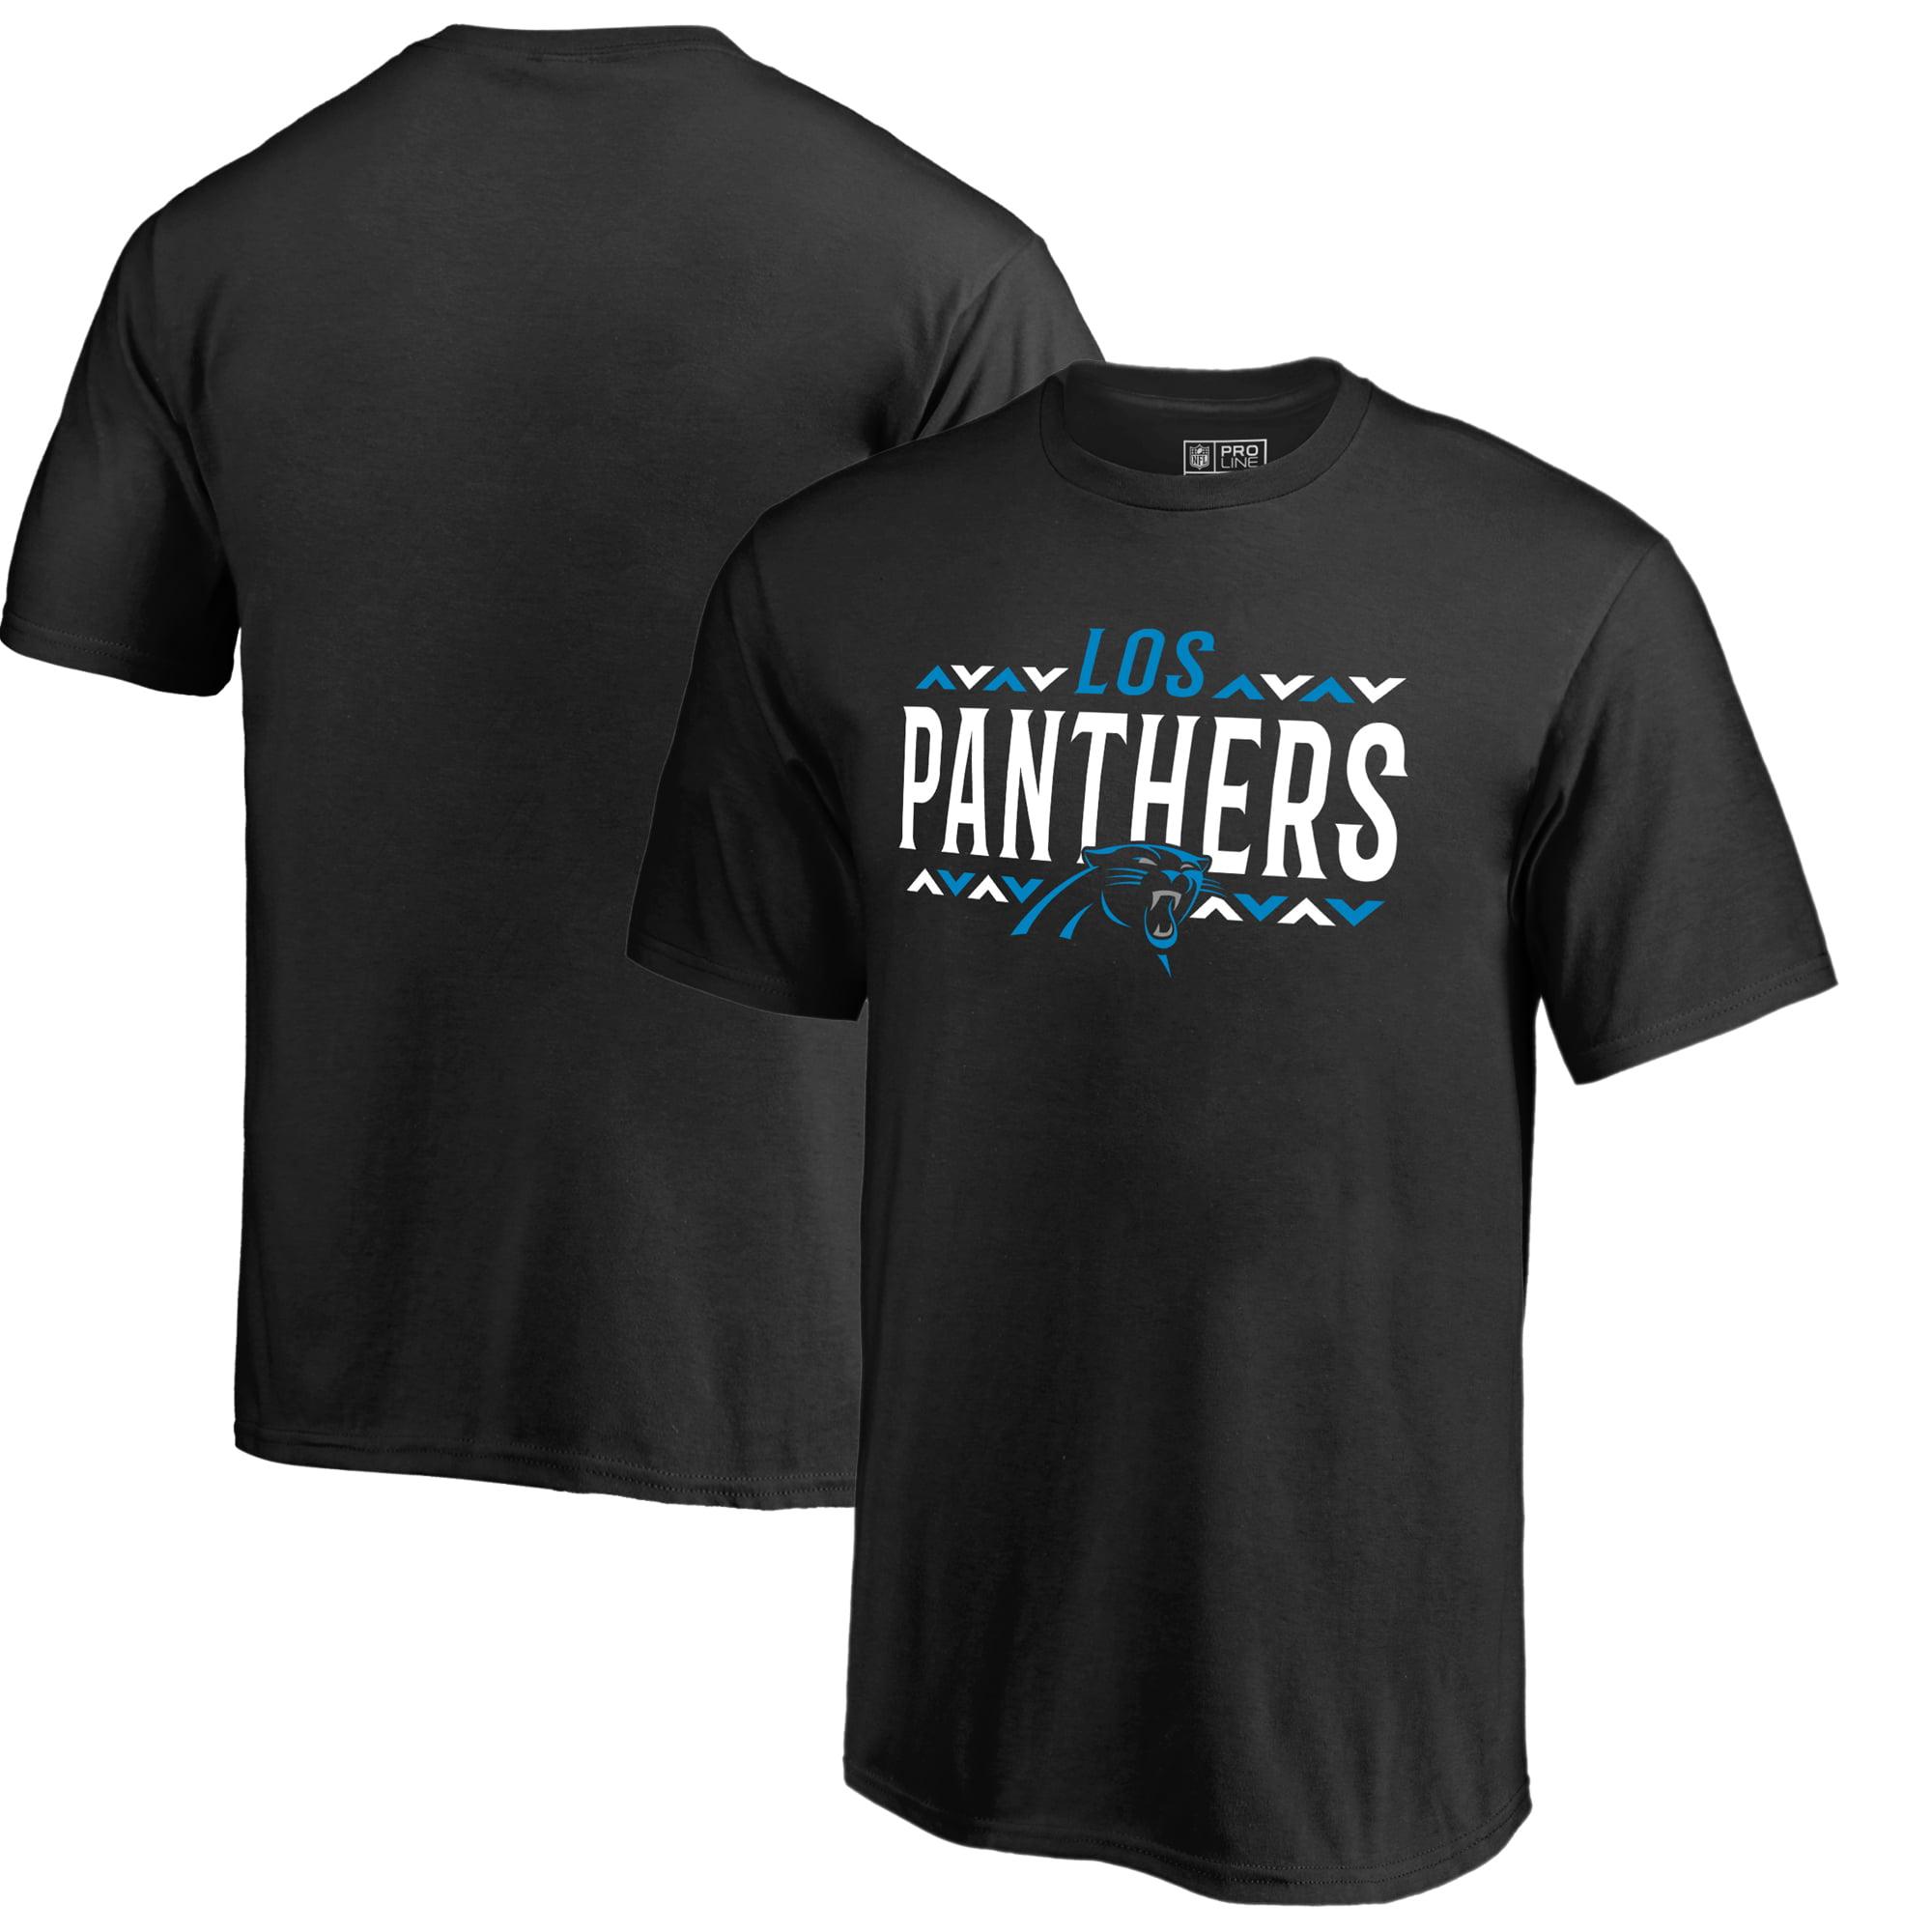 Carolina Panthers NFL Pro Line by Fanatics Branded Youth Arriba T-Shirt - Black